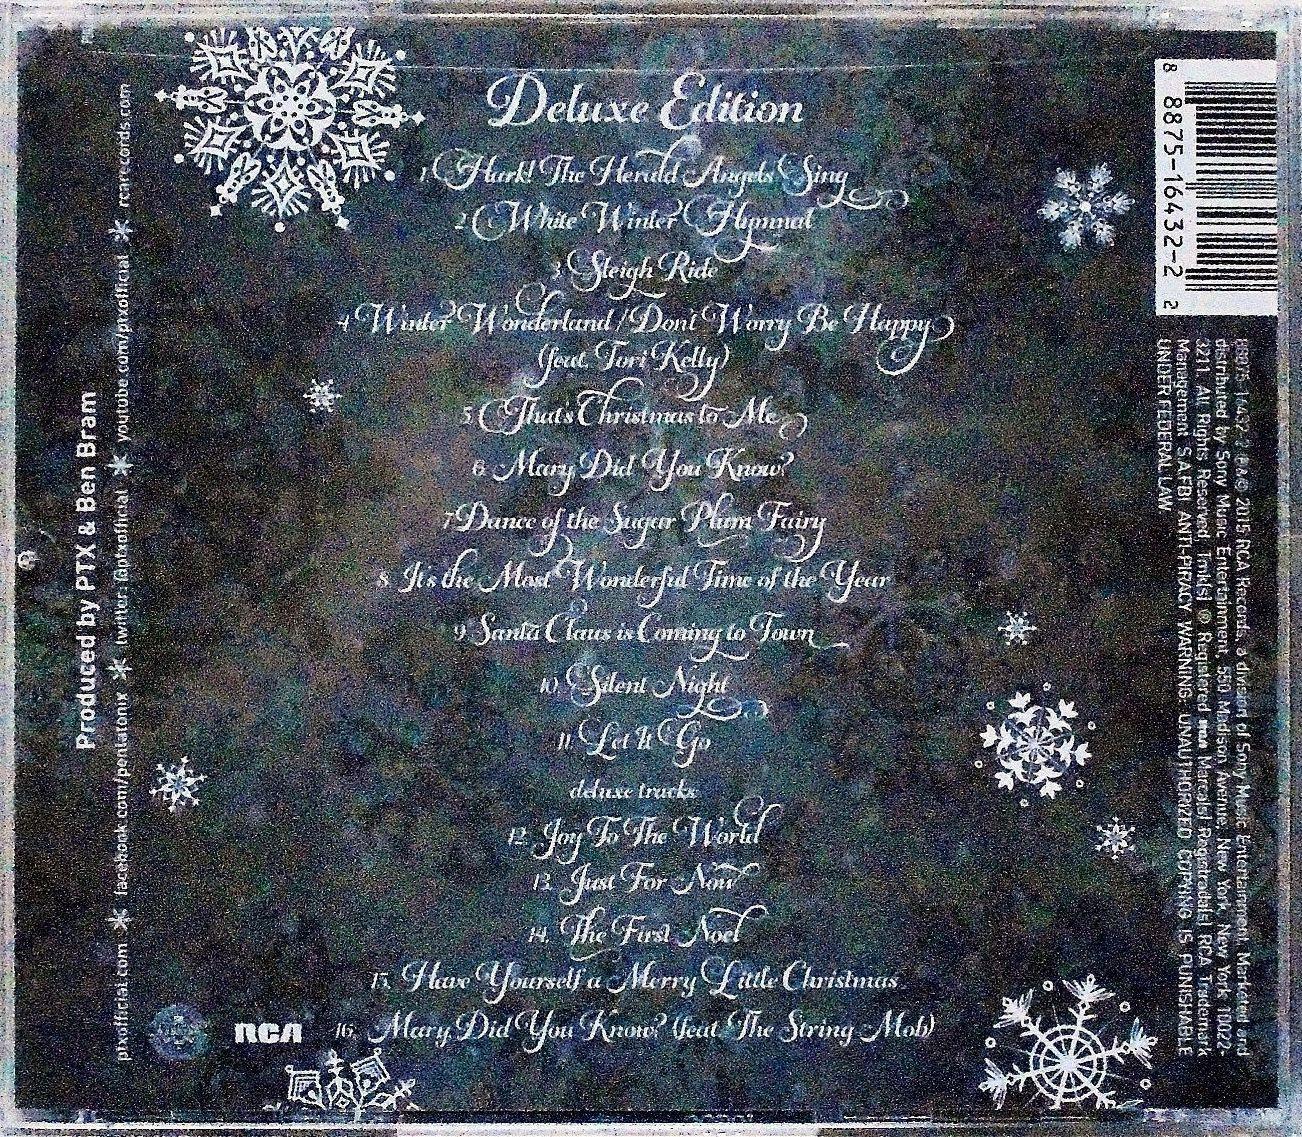 Música de Navidad: PENTATONIX -That's Christmas To Me (Deluxe Edition)